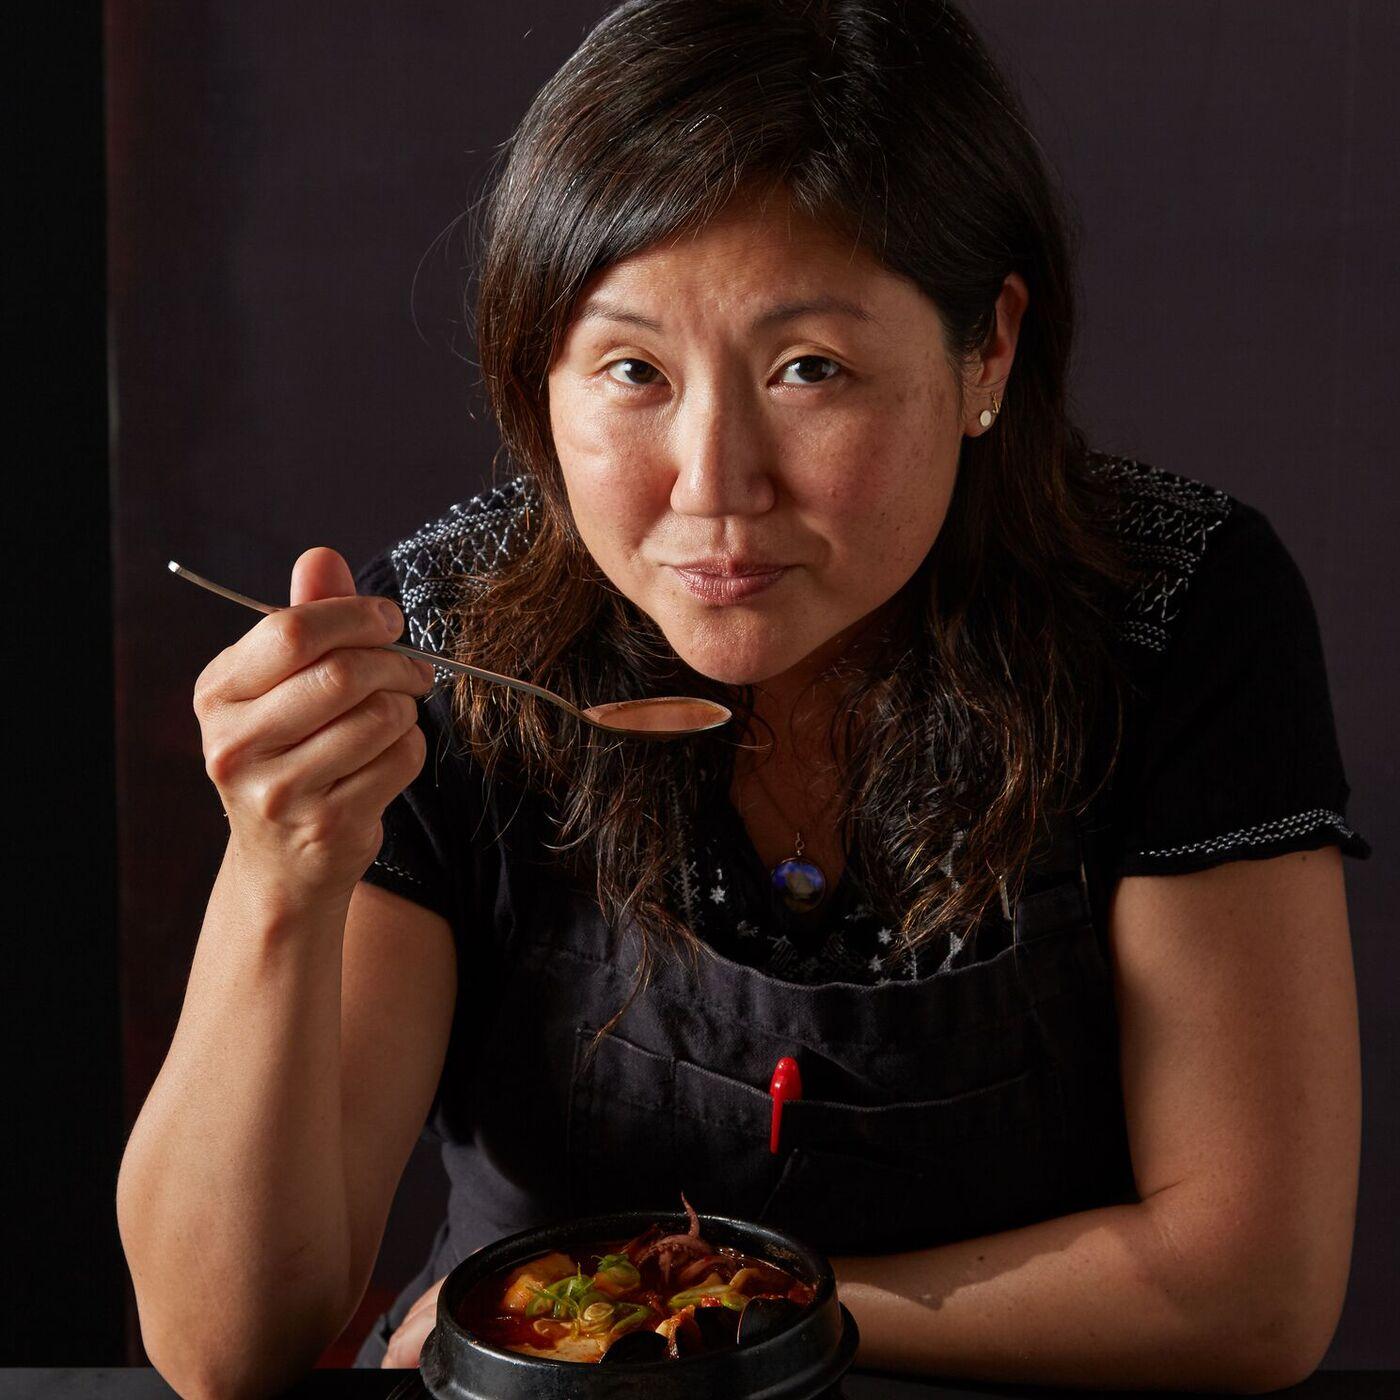 Sohui Kim - Restaurants; Where Community Comes Together (Re-release)